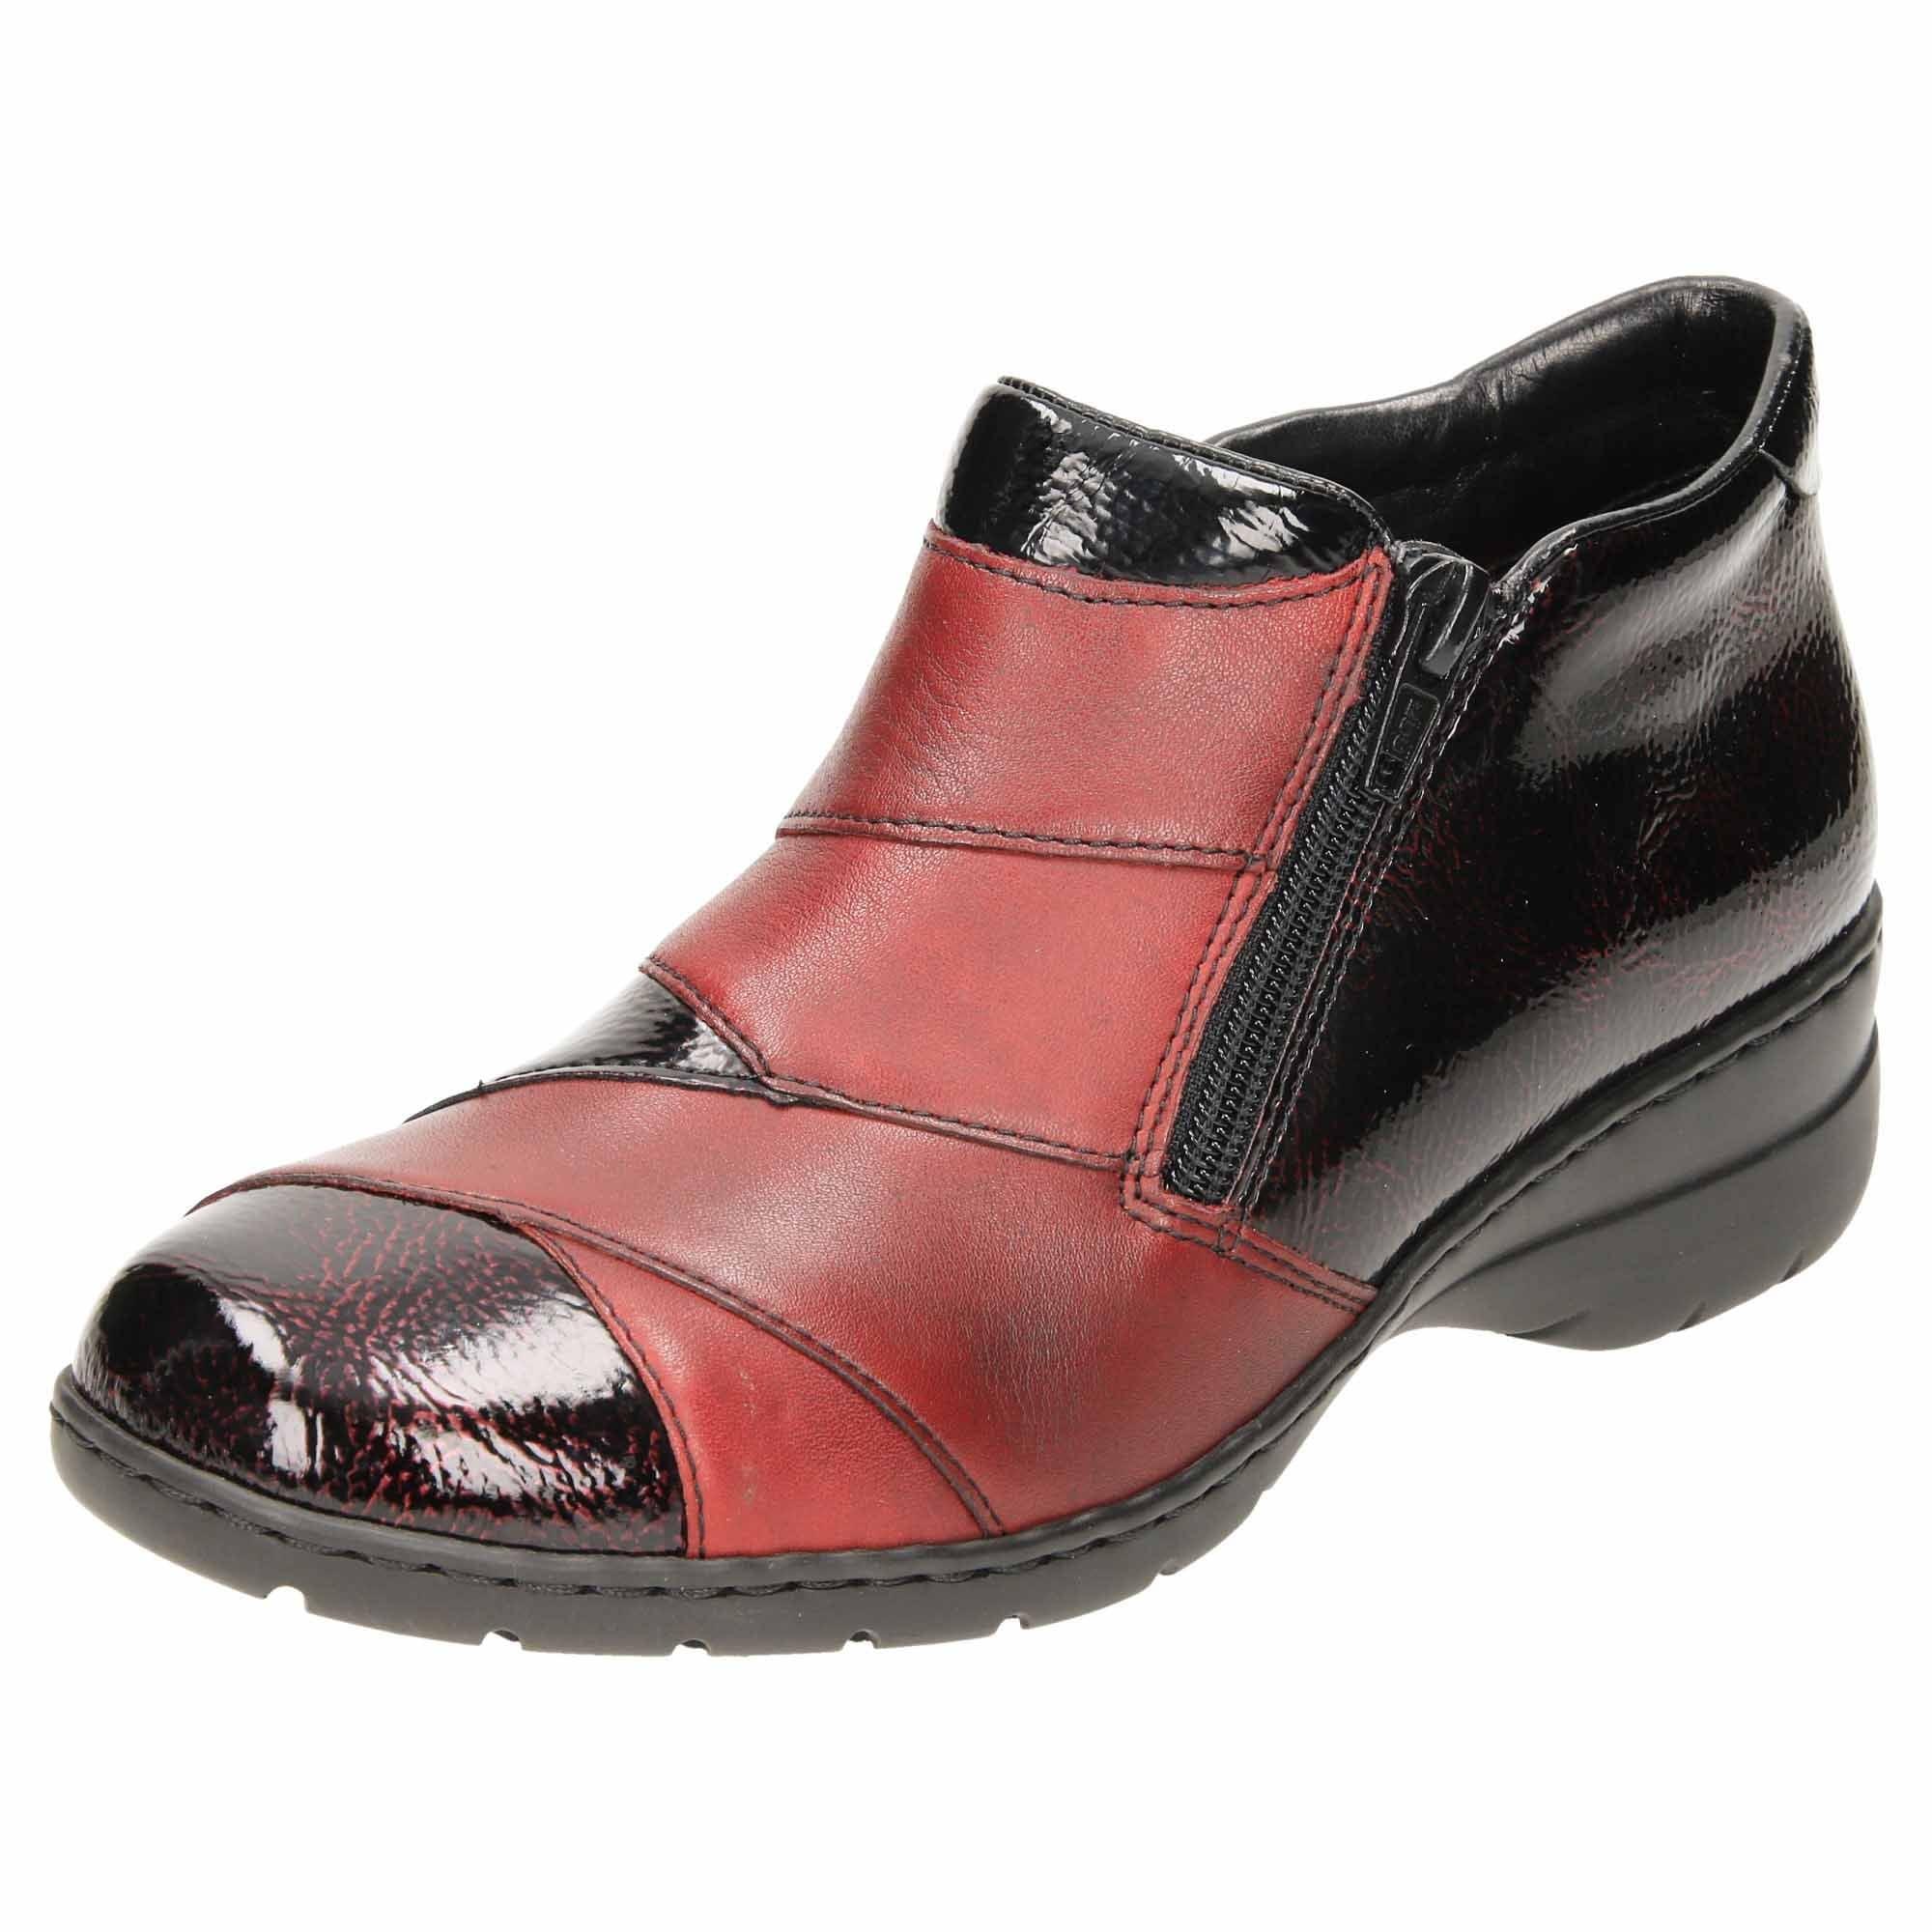 Rieker Tan Black Flat Leather Low Block Heel Ankle Boots Trouser Shoes 76961